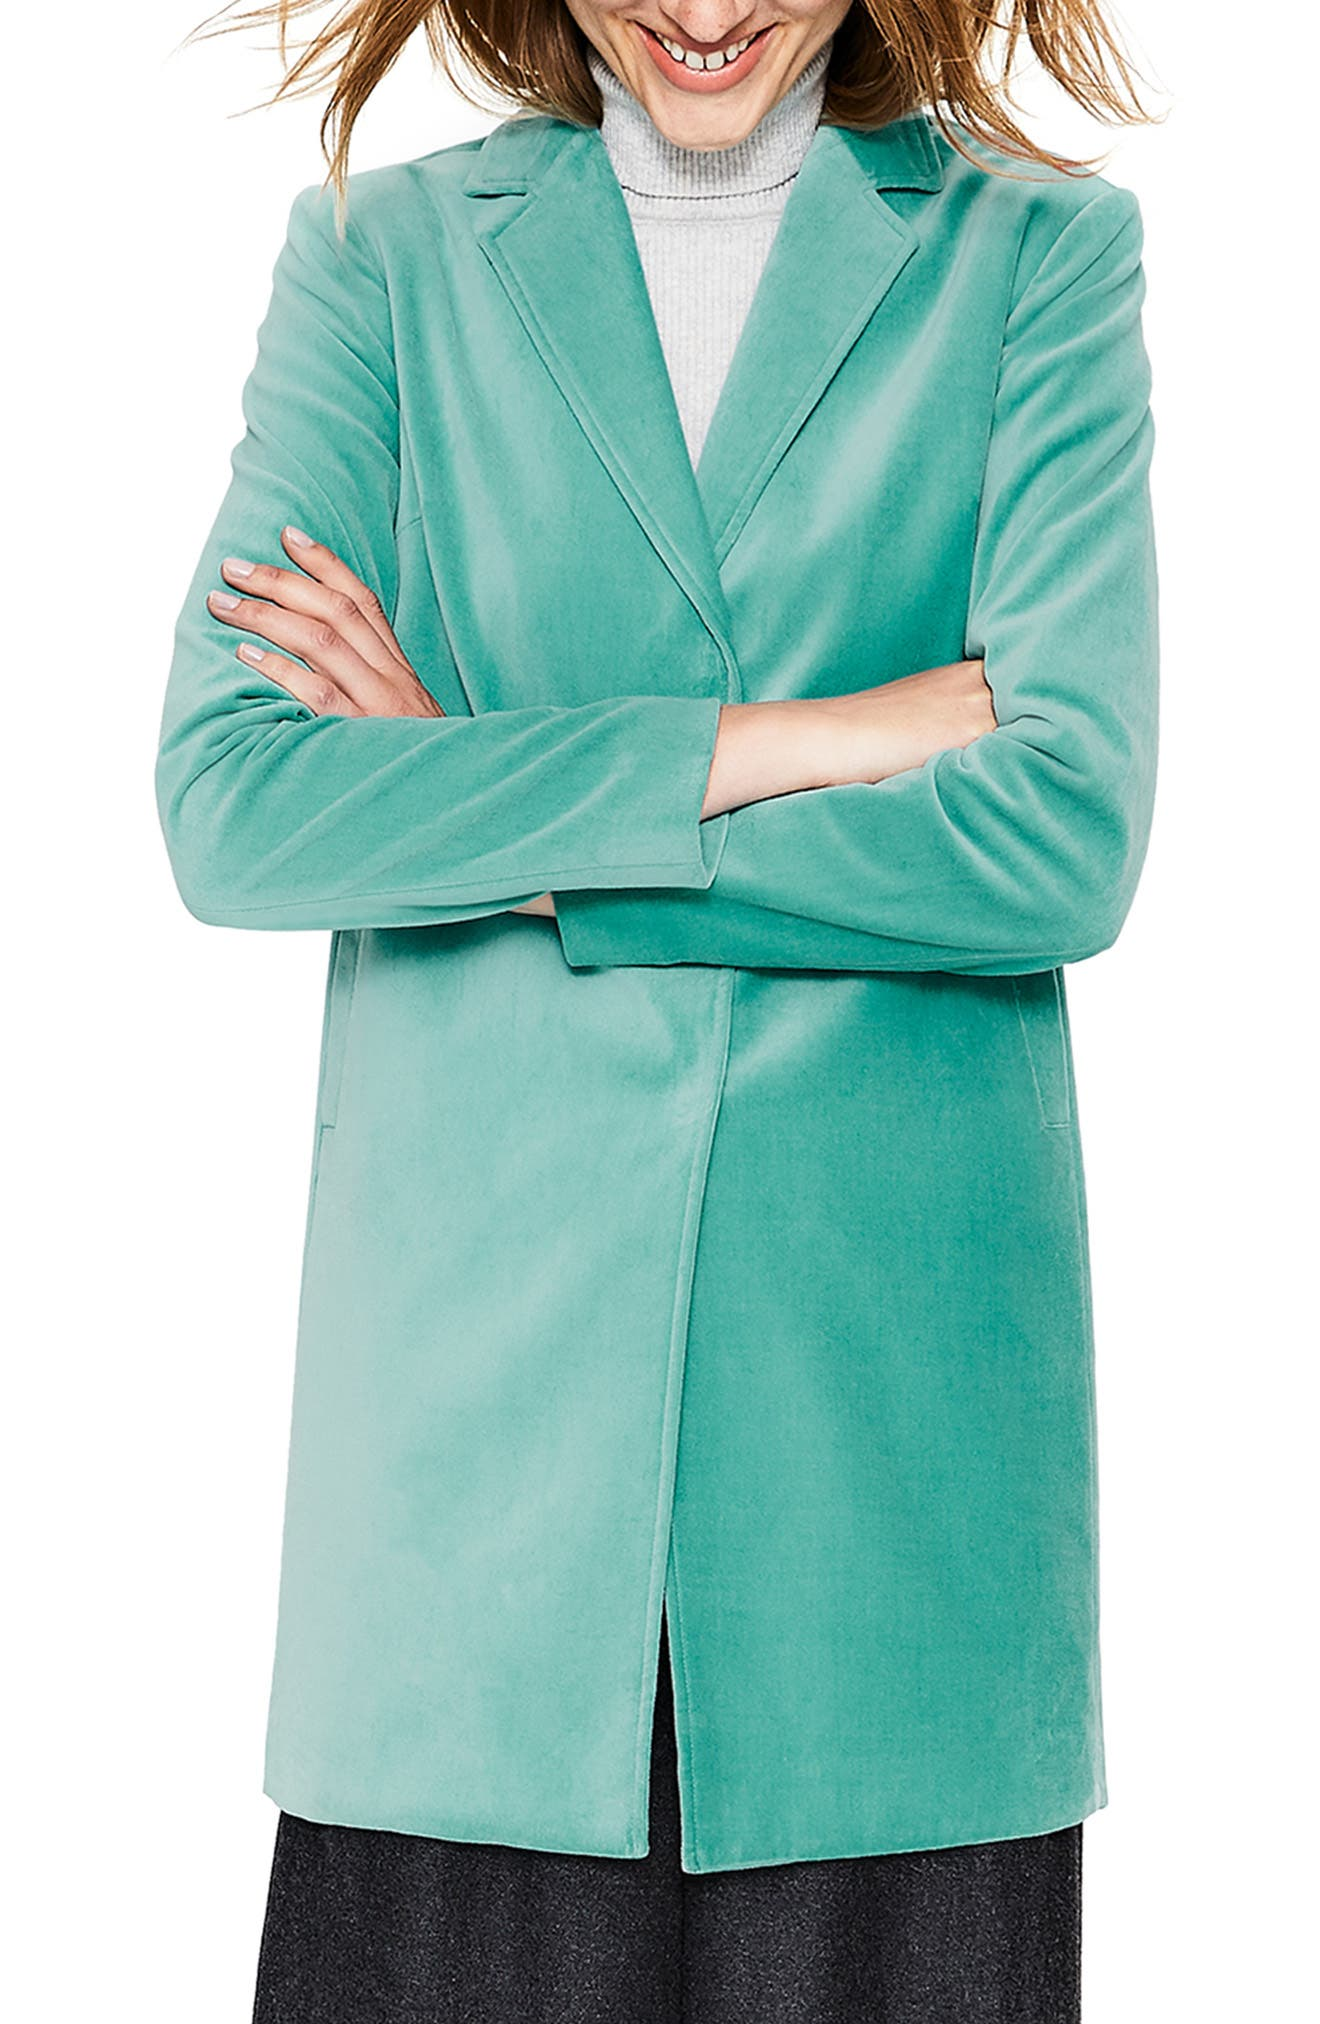 Sally Long Velvet Jacket,                         Main,                         color, BREEZE BN764